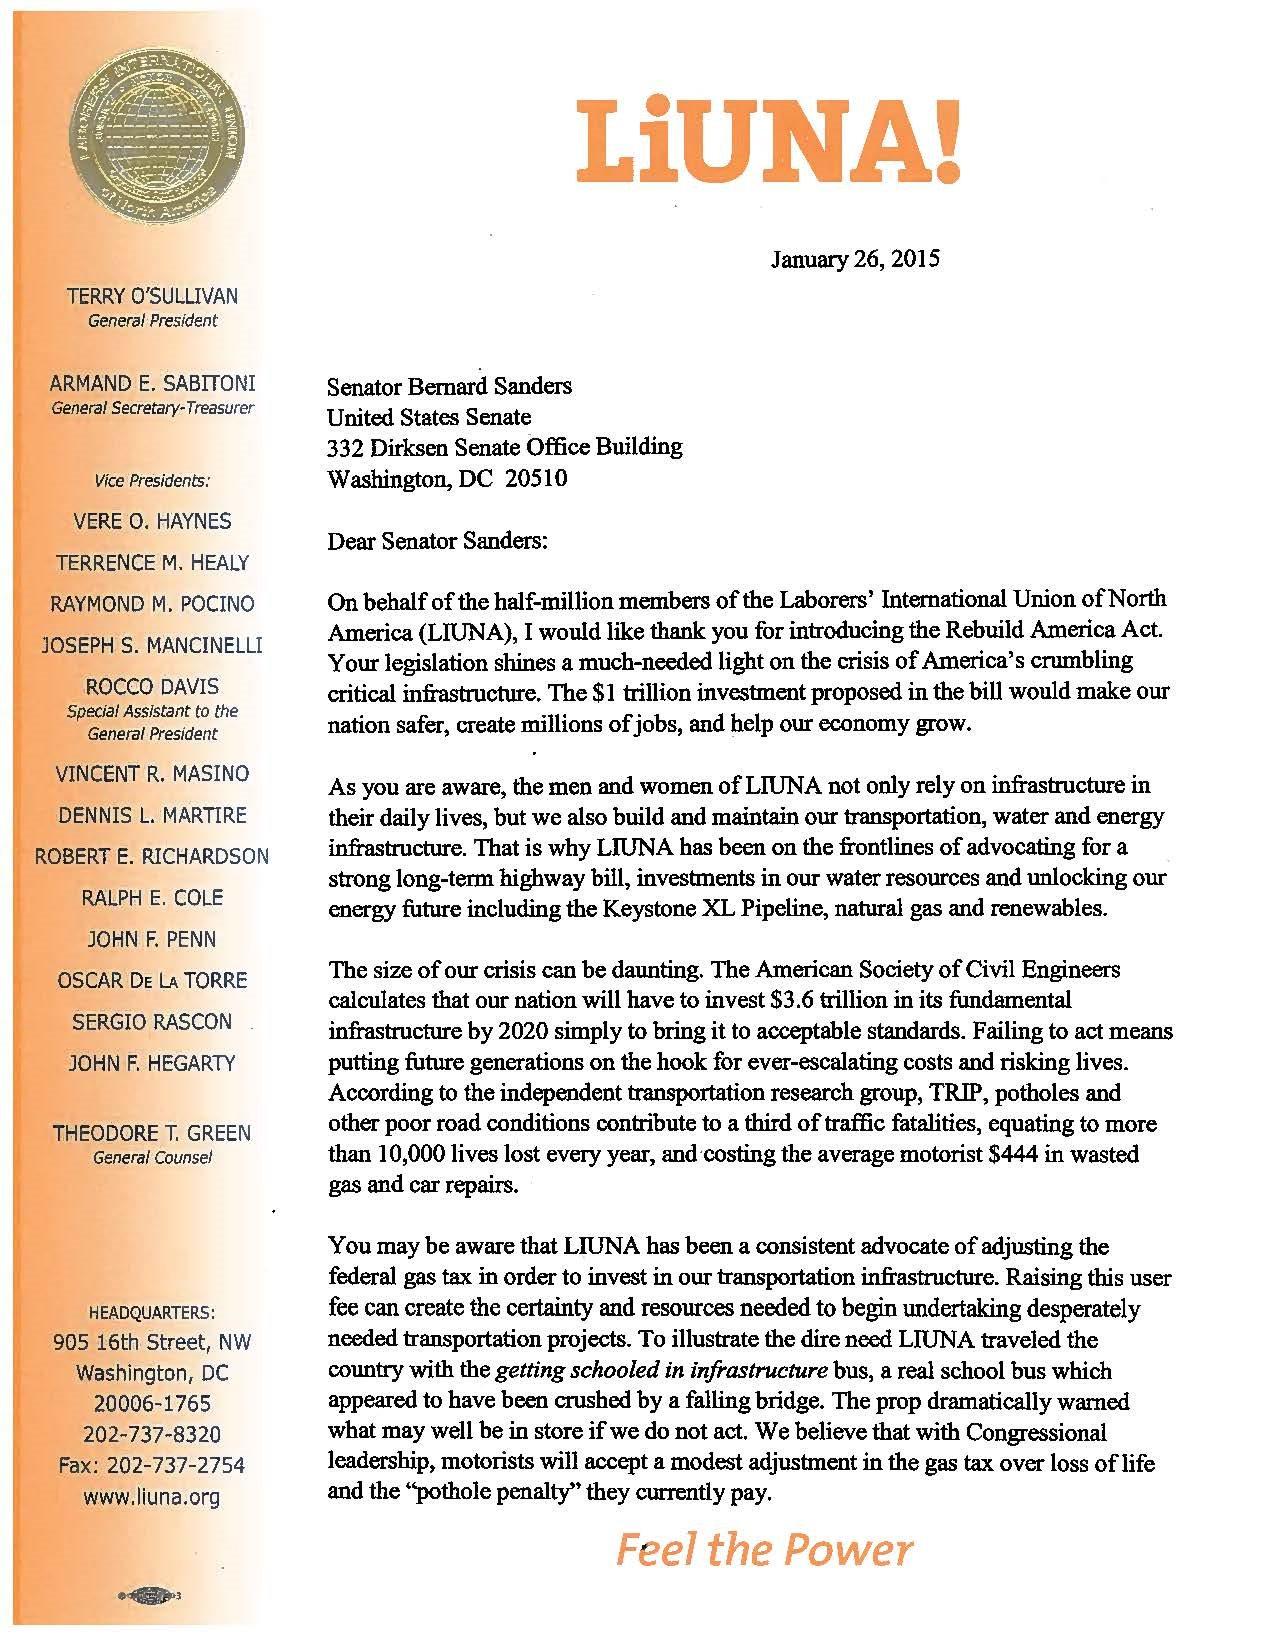 LIUNA Letter in Support of Senator Sanders Rebuild America Act_Page_1.jpg